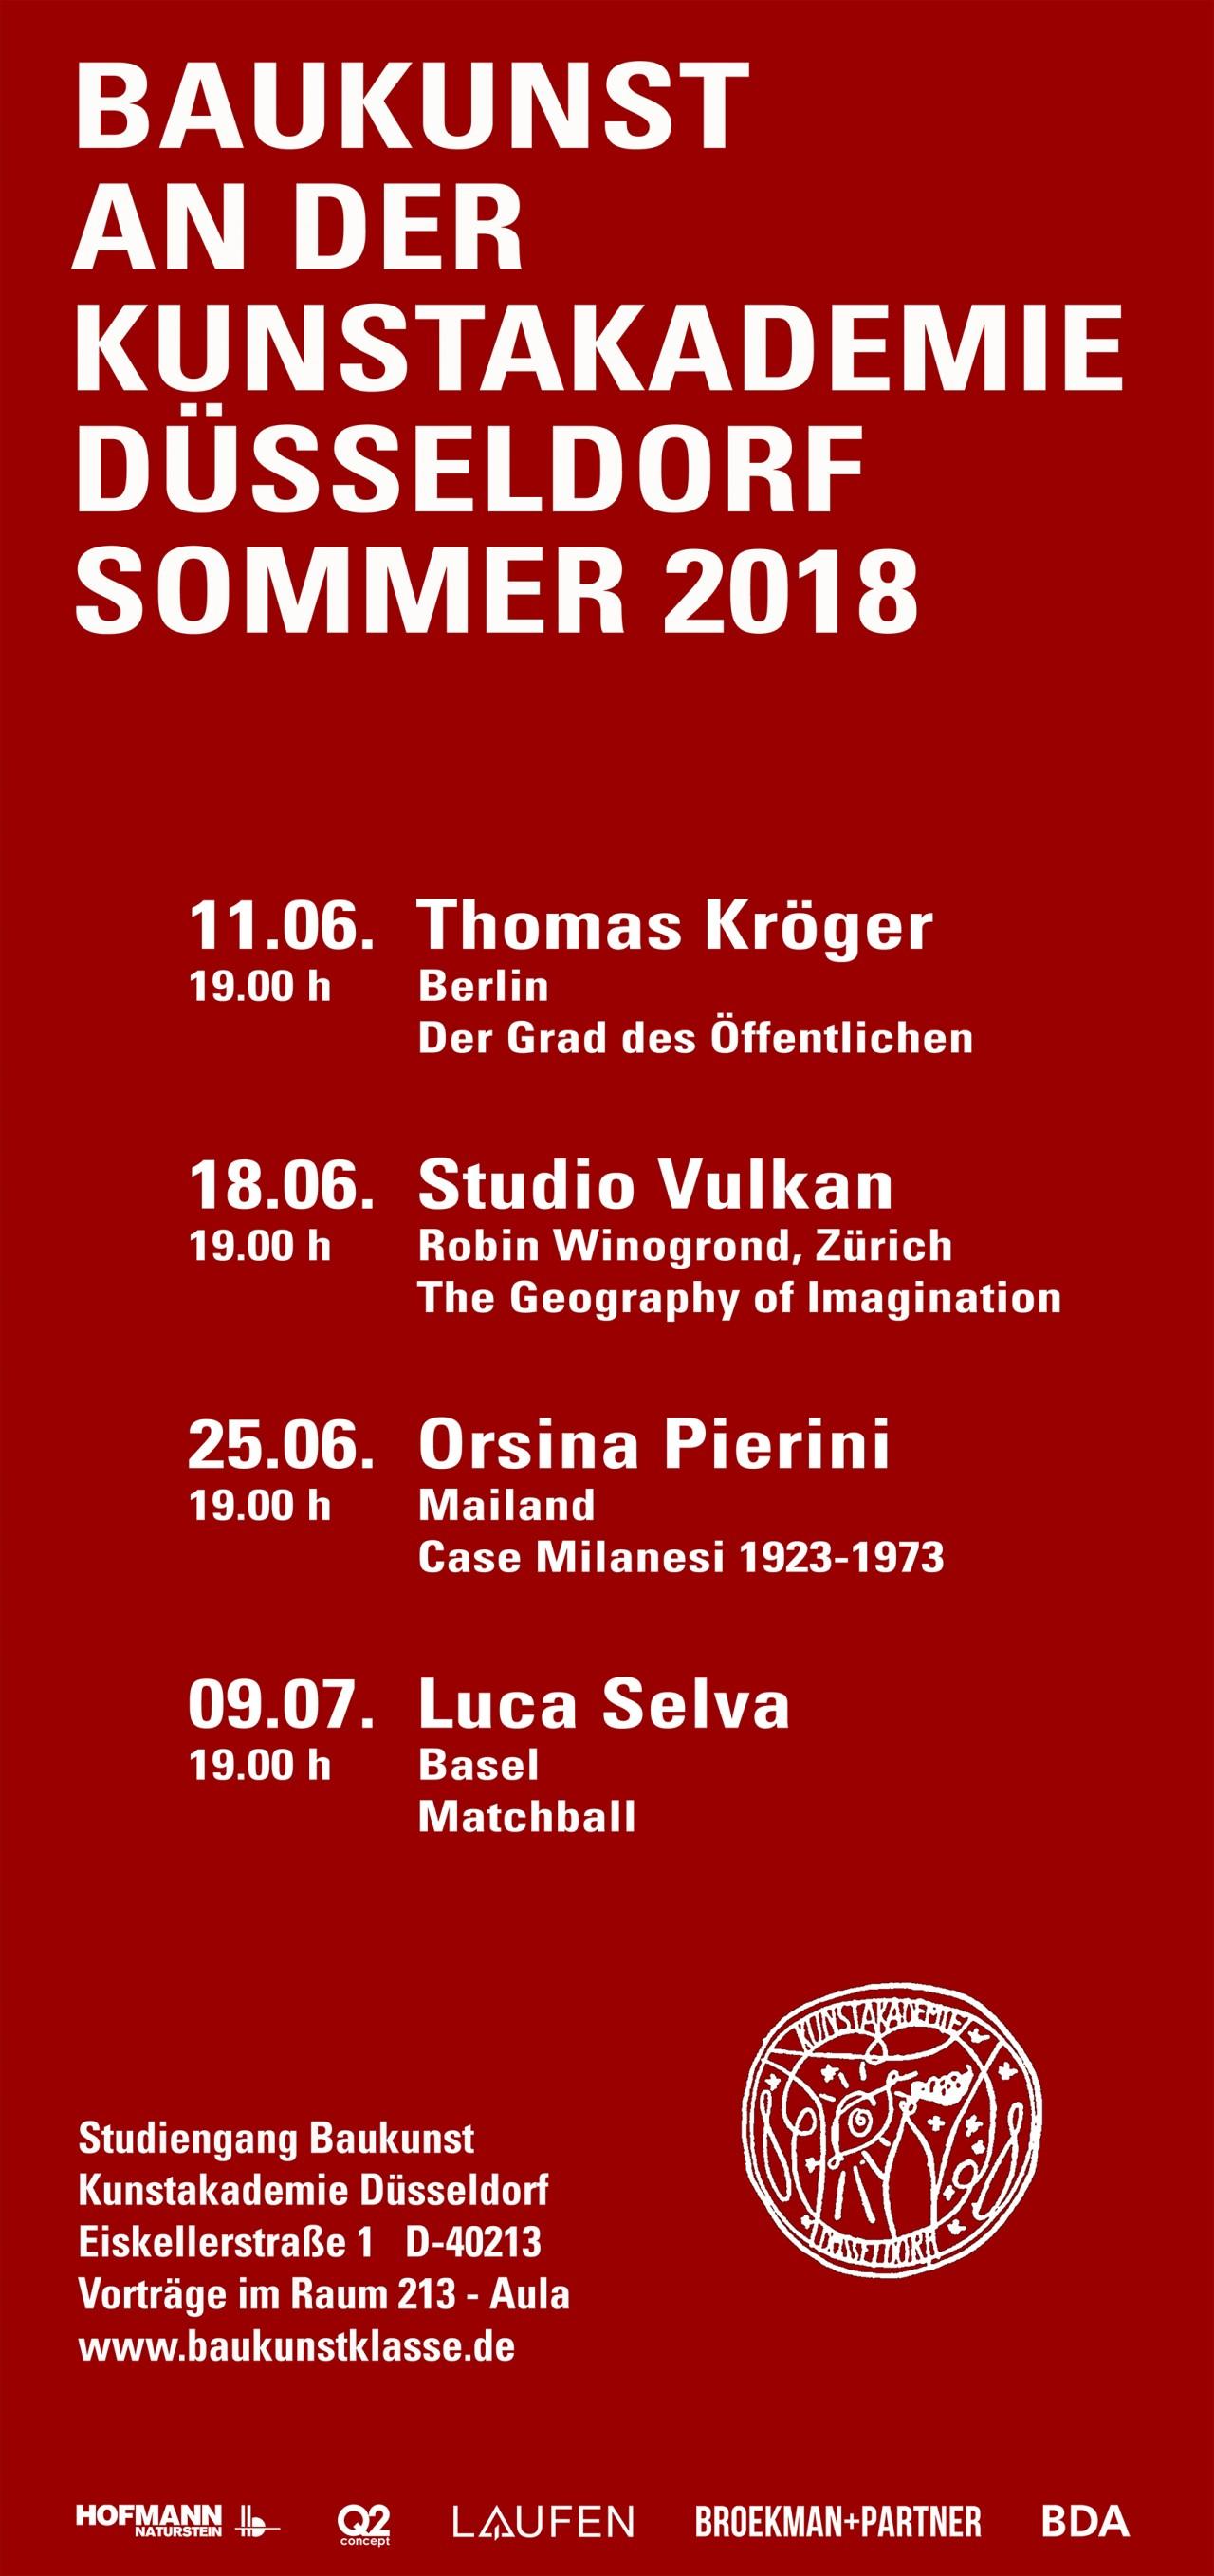 Broekman+Partner Baukunst Kunstakademie Düsseldorf Sommersemester 2018